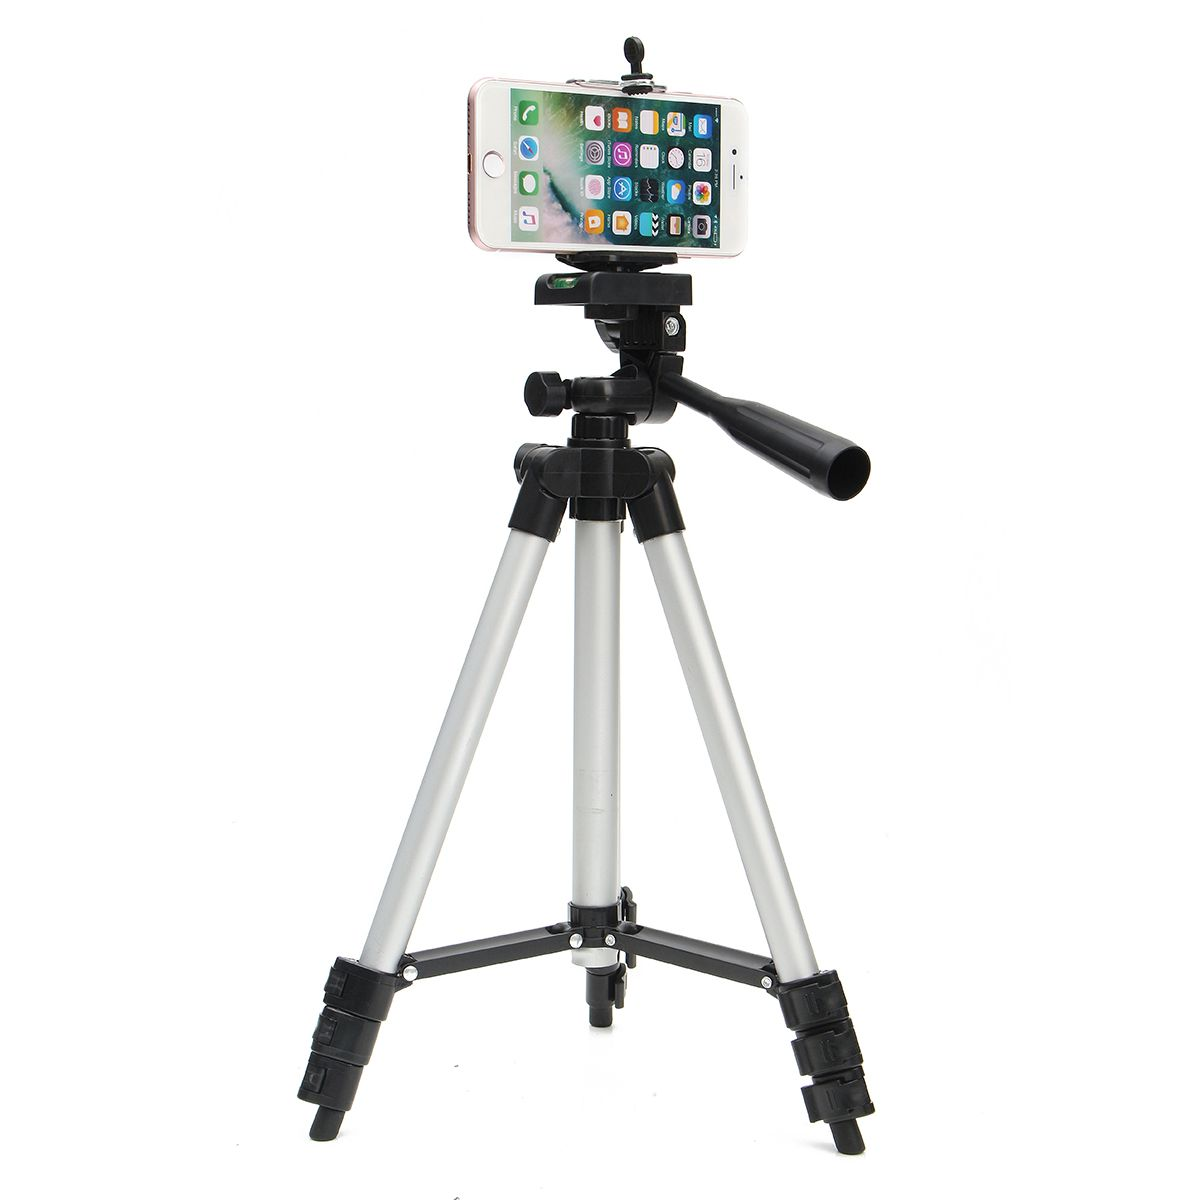 Professional Camera Adjustable Tripod Stand Holder Live Selfie Stick for iPhone